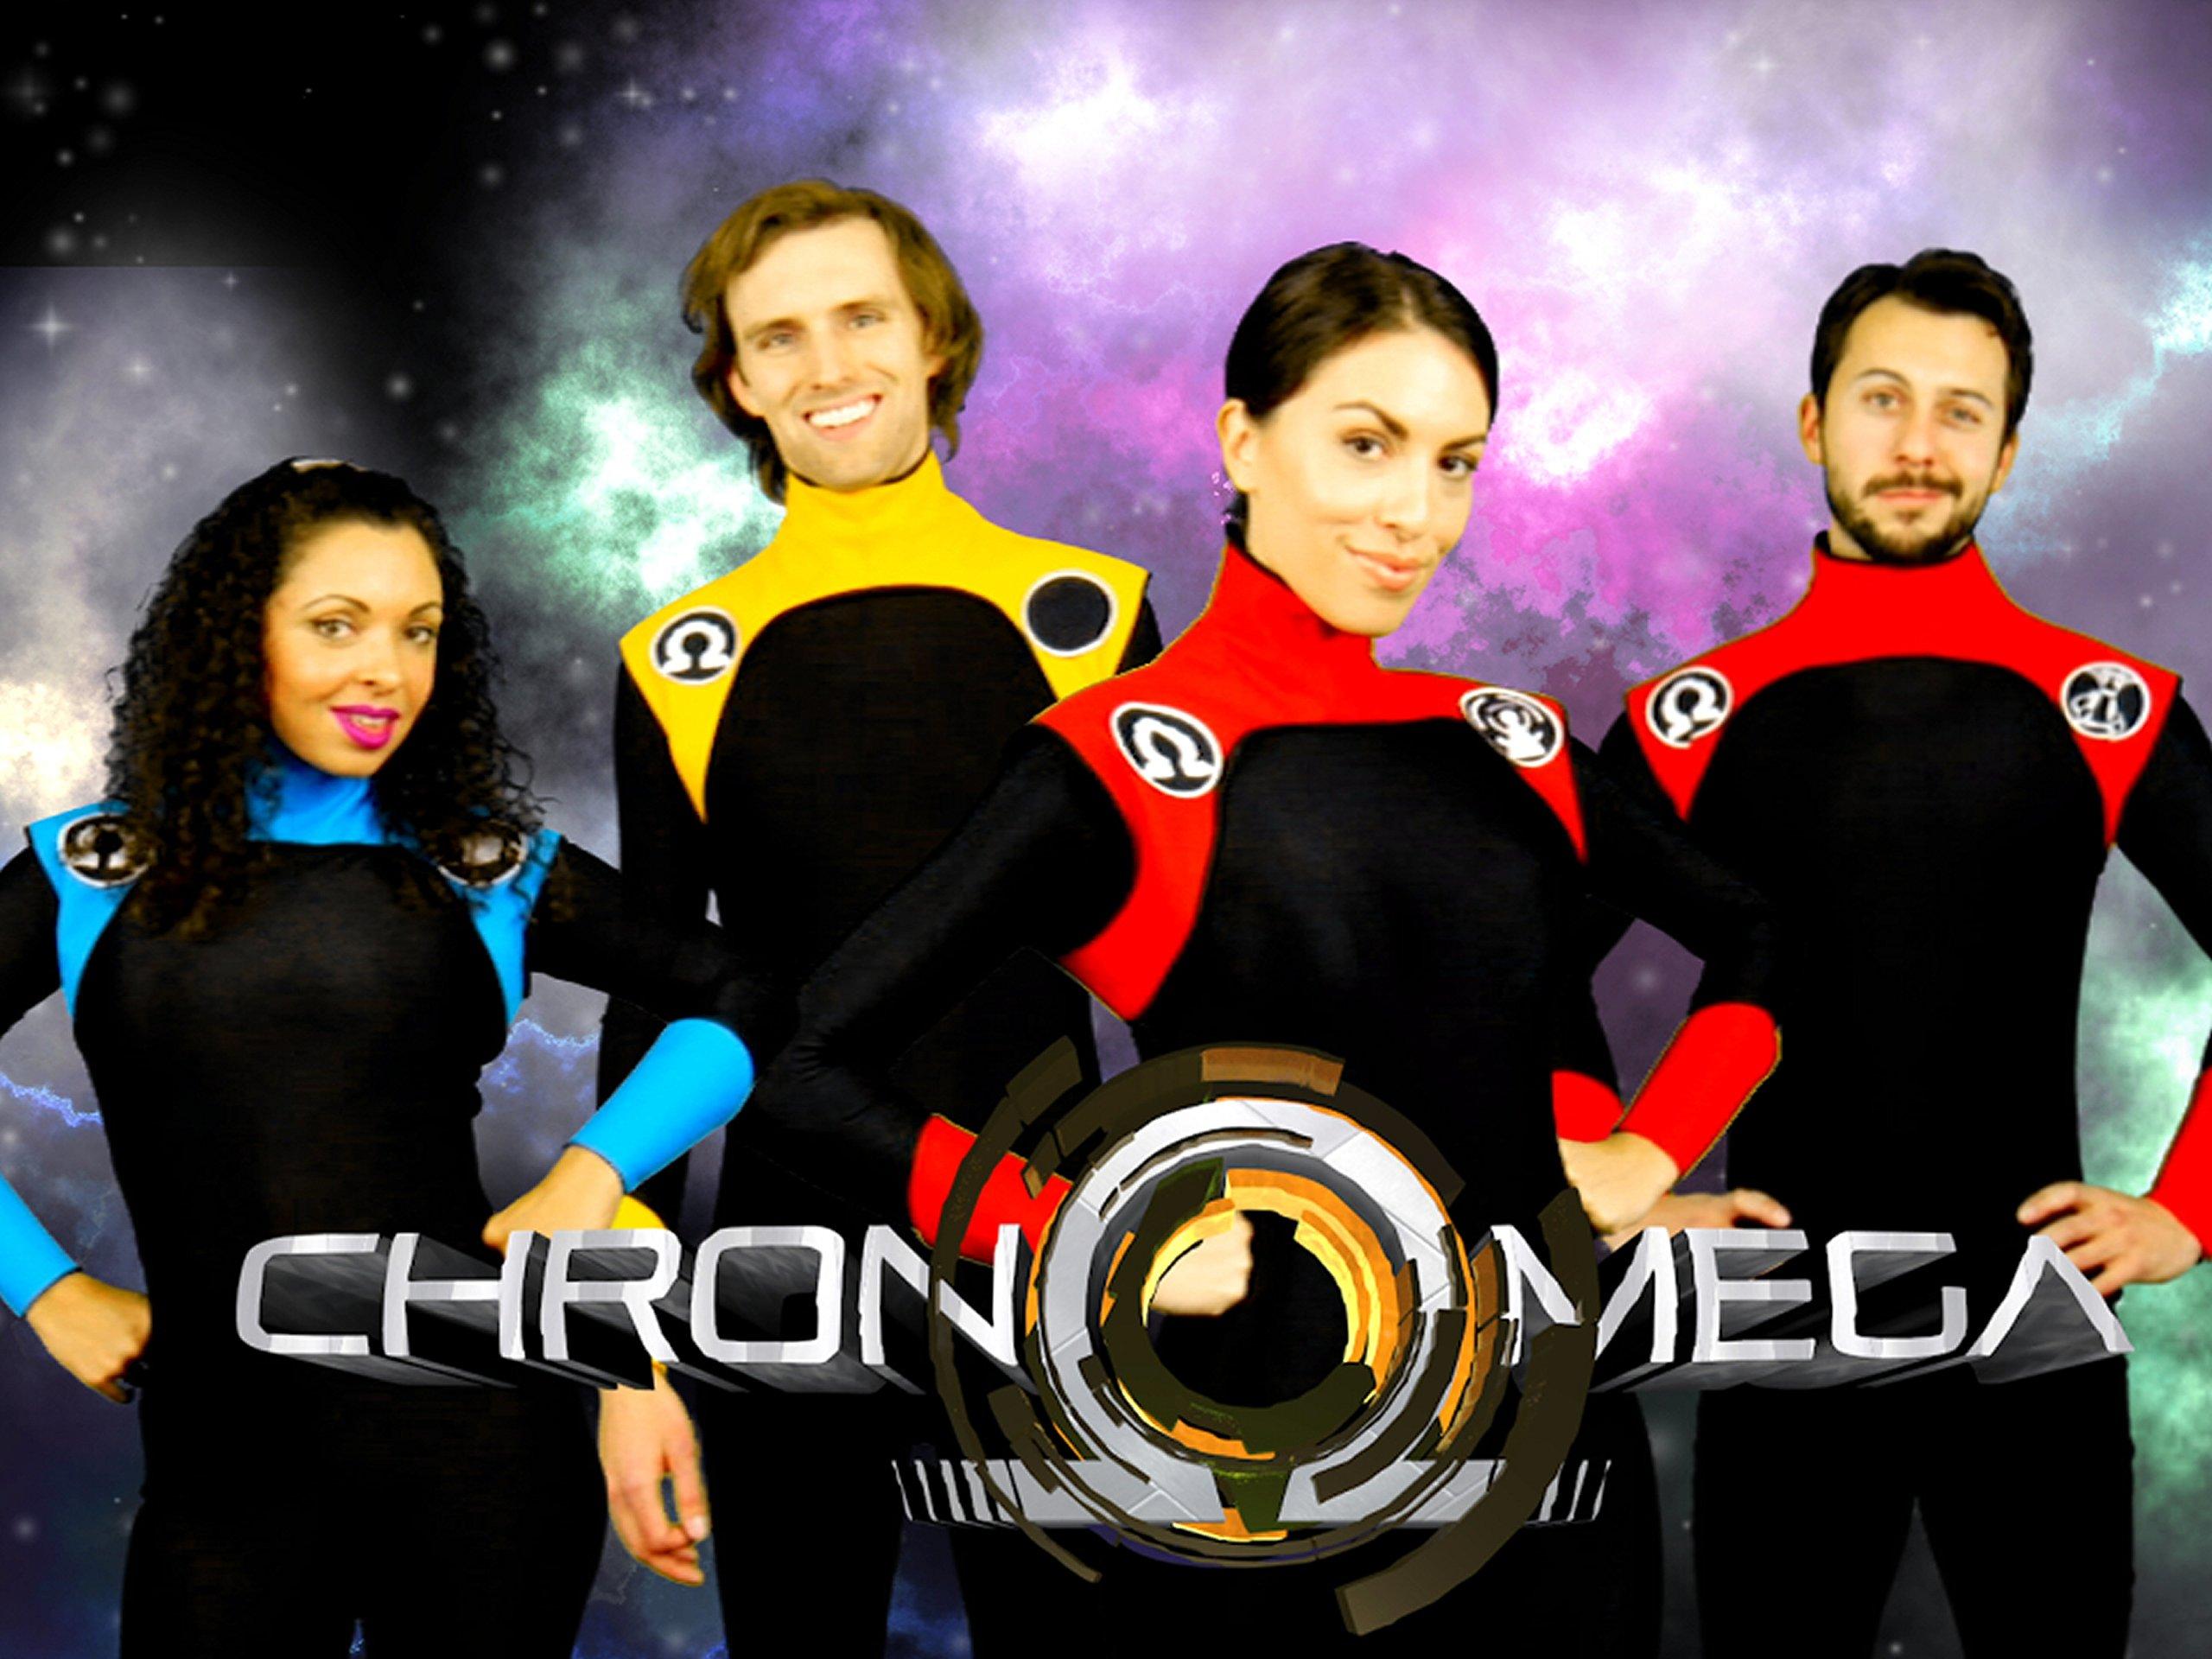 Chronomega - Season 1